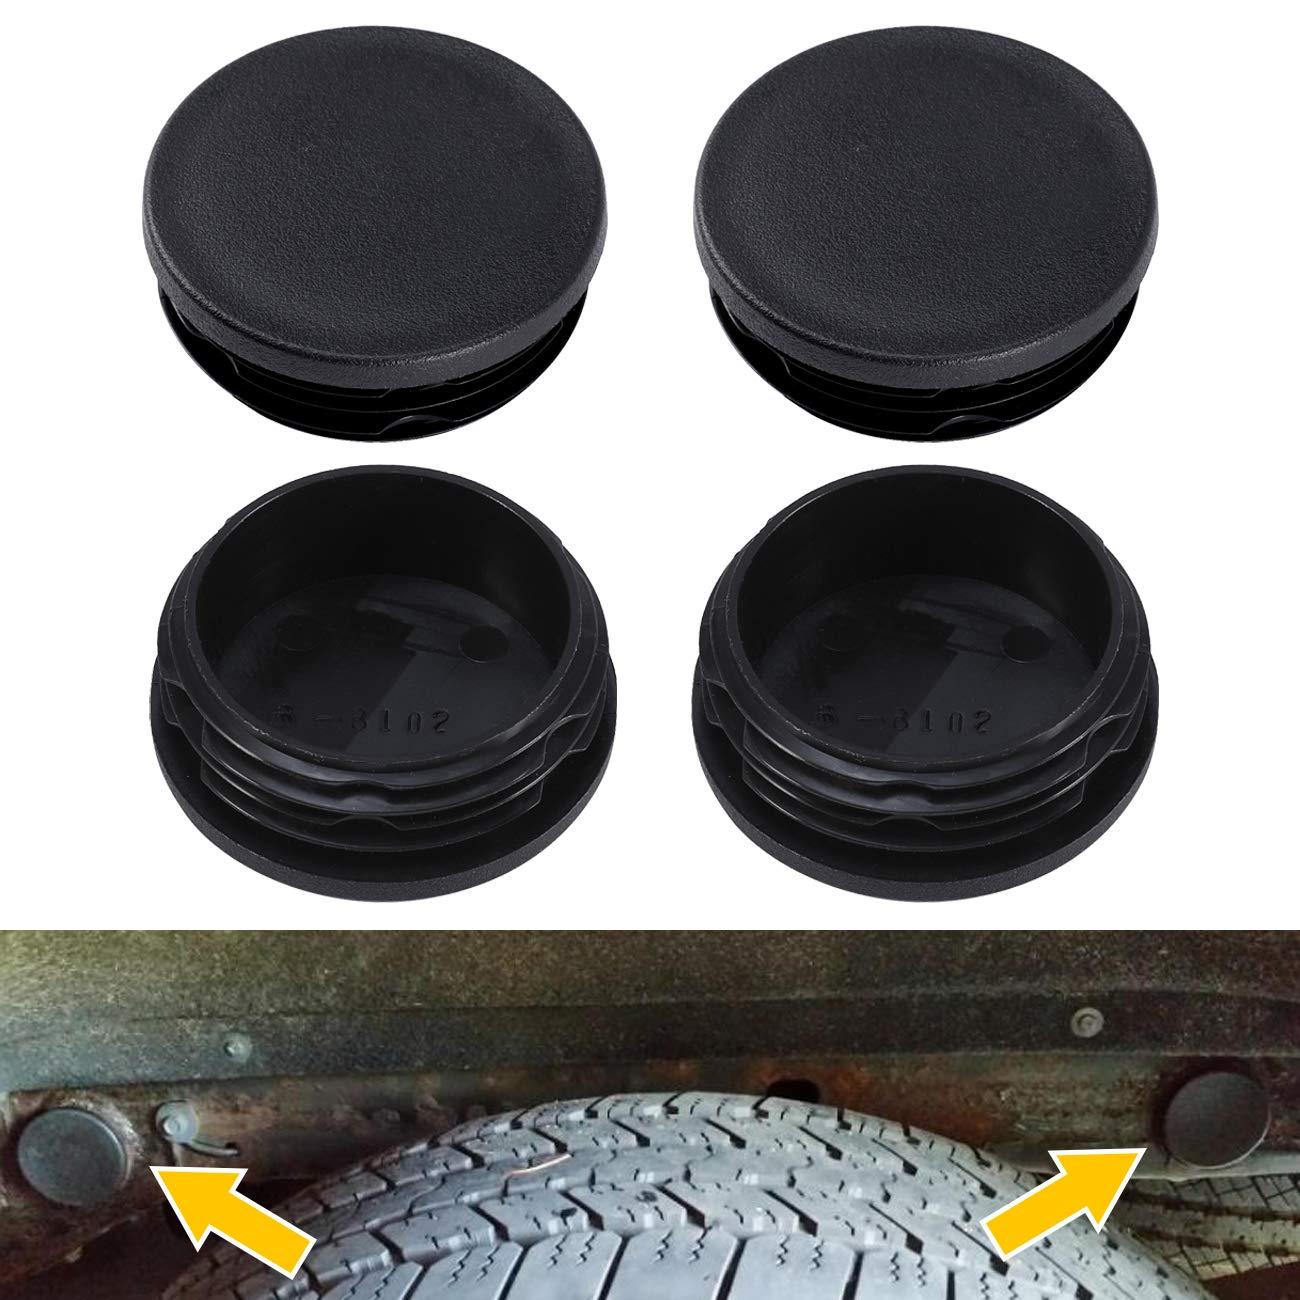 4pcs Frame Tube Hole Plugs Sammanlight Rubber Cover for Chevy Silverado 1500 GMC Sierra 1500 1999-2018 Rear Wheel Well Hole Caps